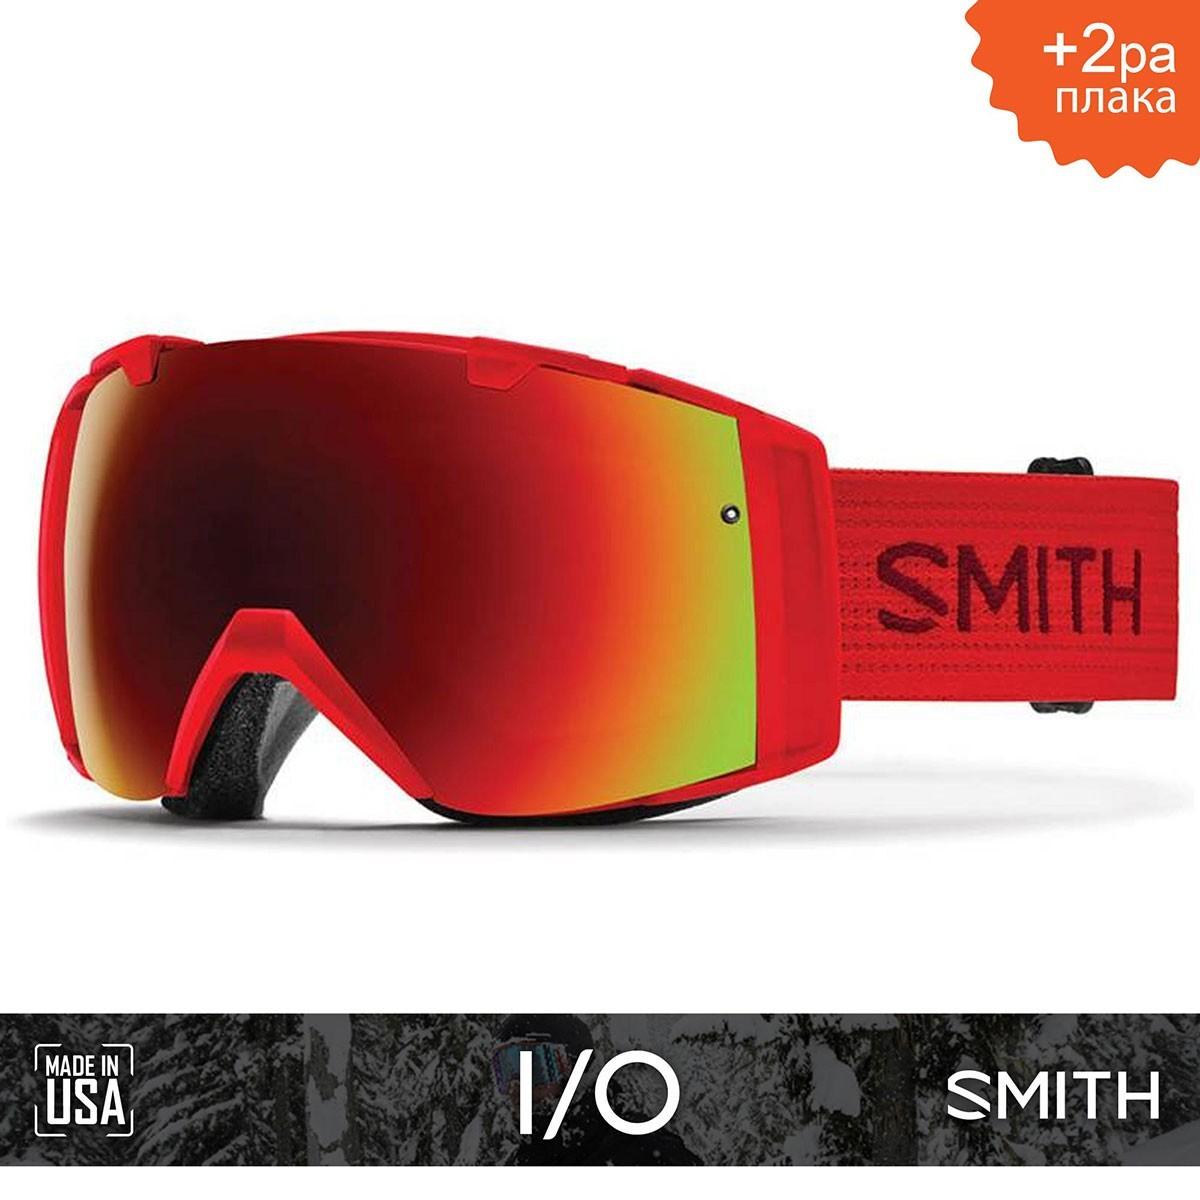 SMITH I/O Fire | S3 RED SOL-X Mirror - Изображение - AQUAMATRIX